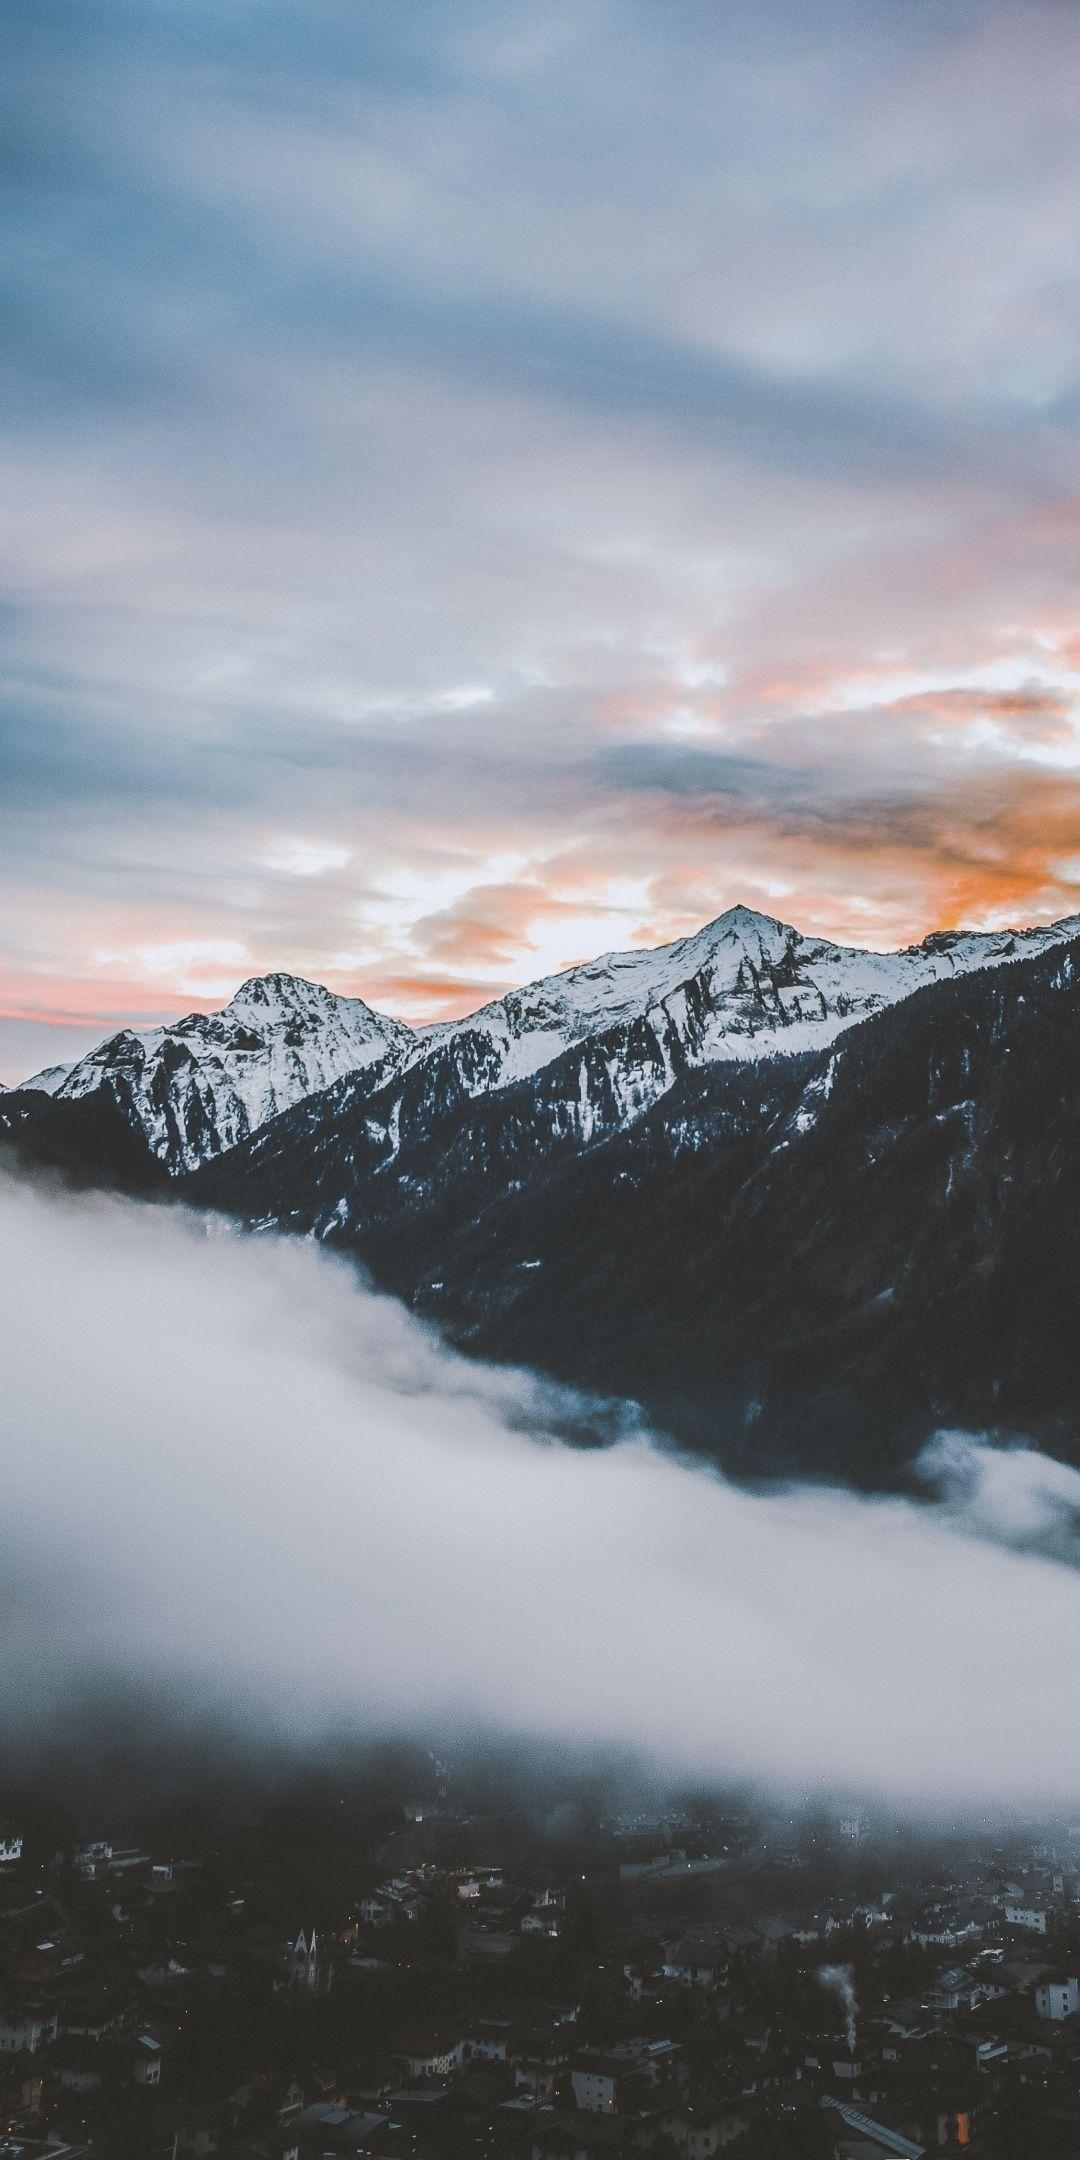 Clouds Mountains Sunset Nature 1080x2160 Wallpaper Mountain